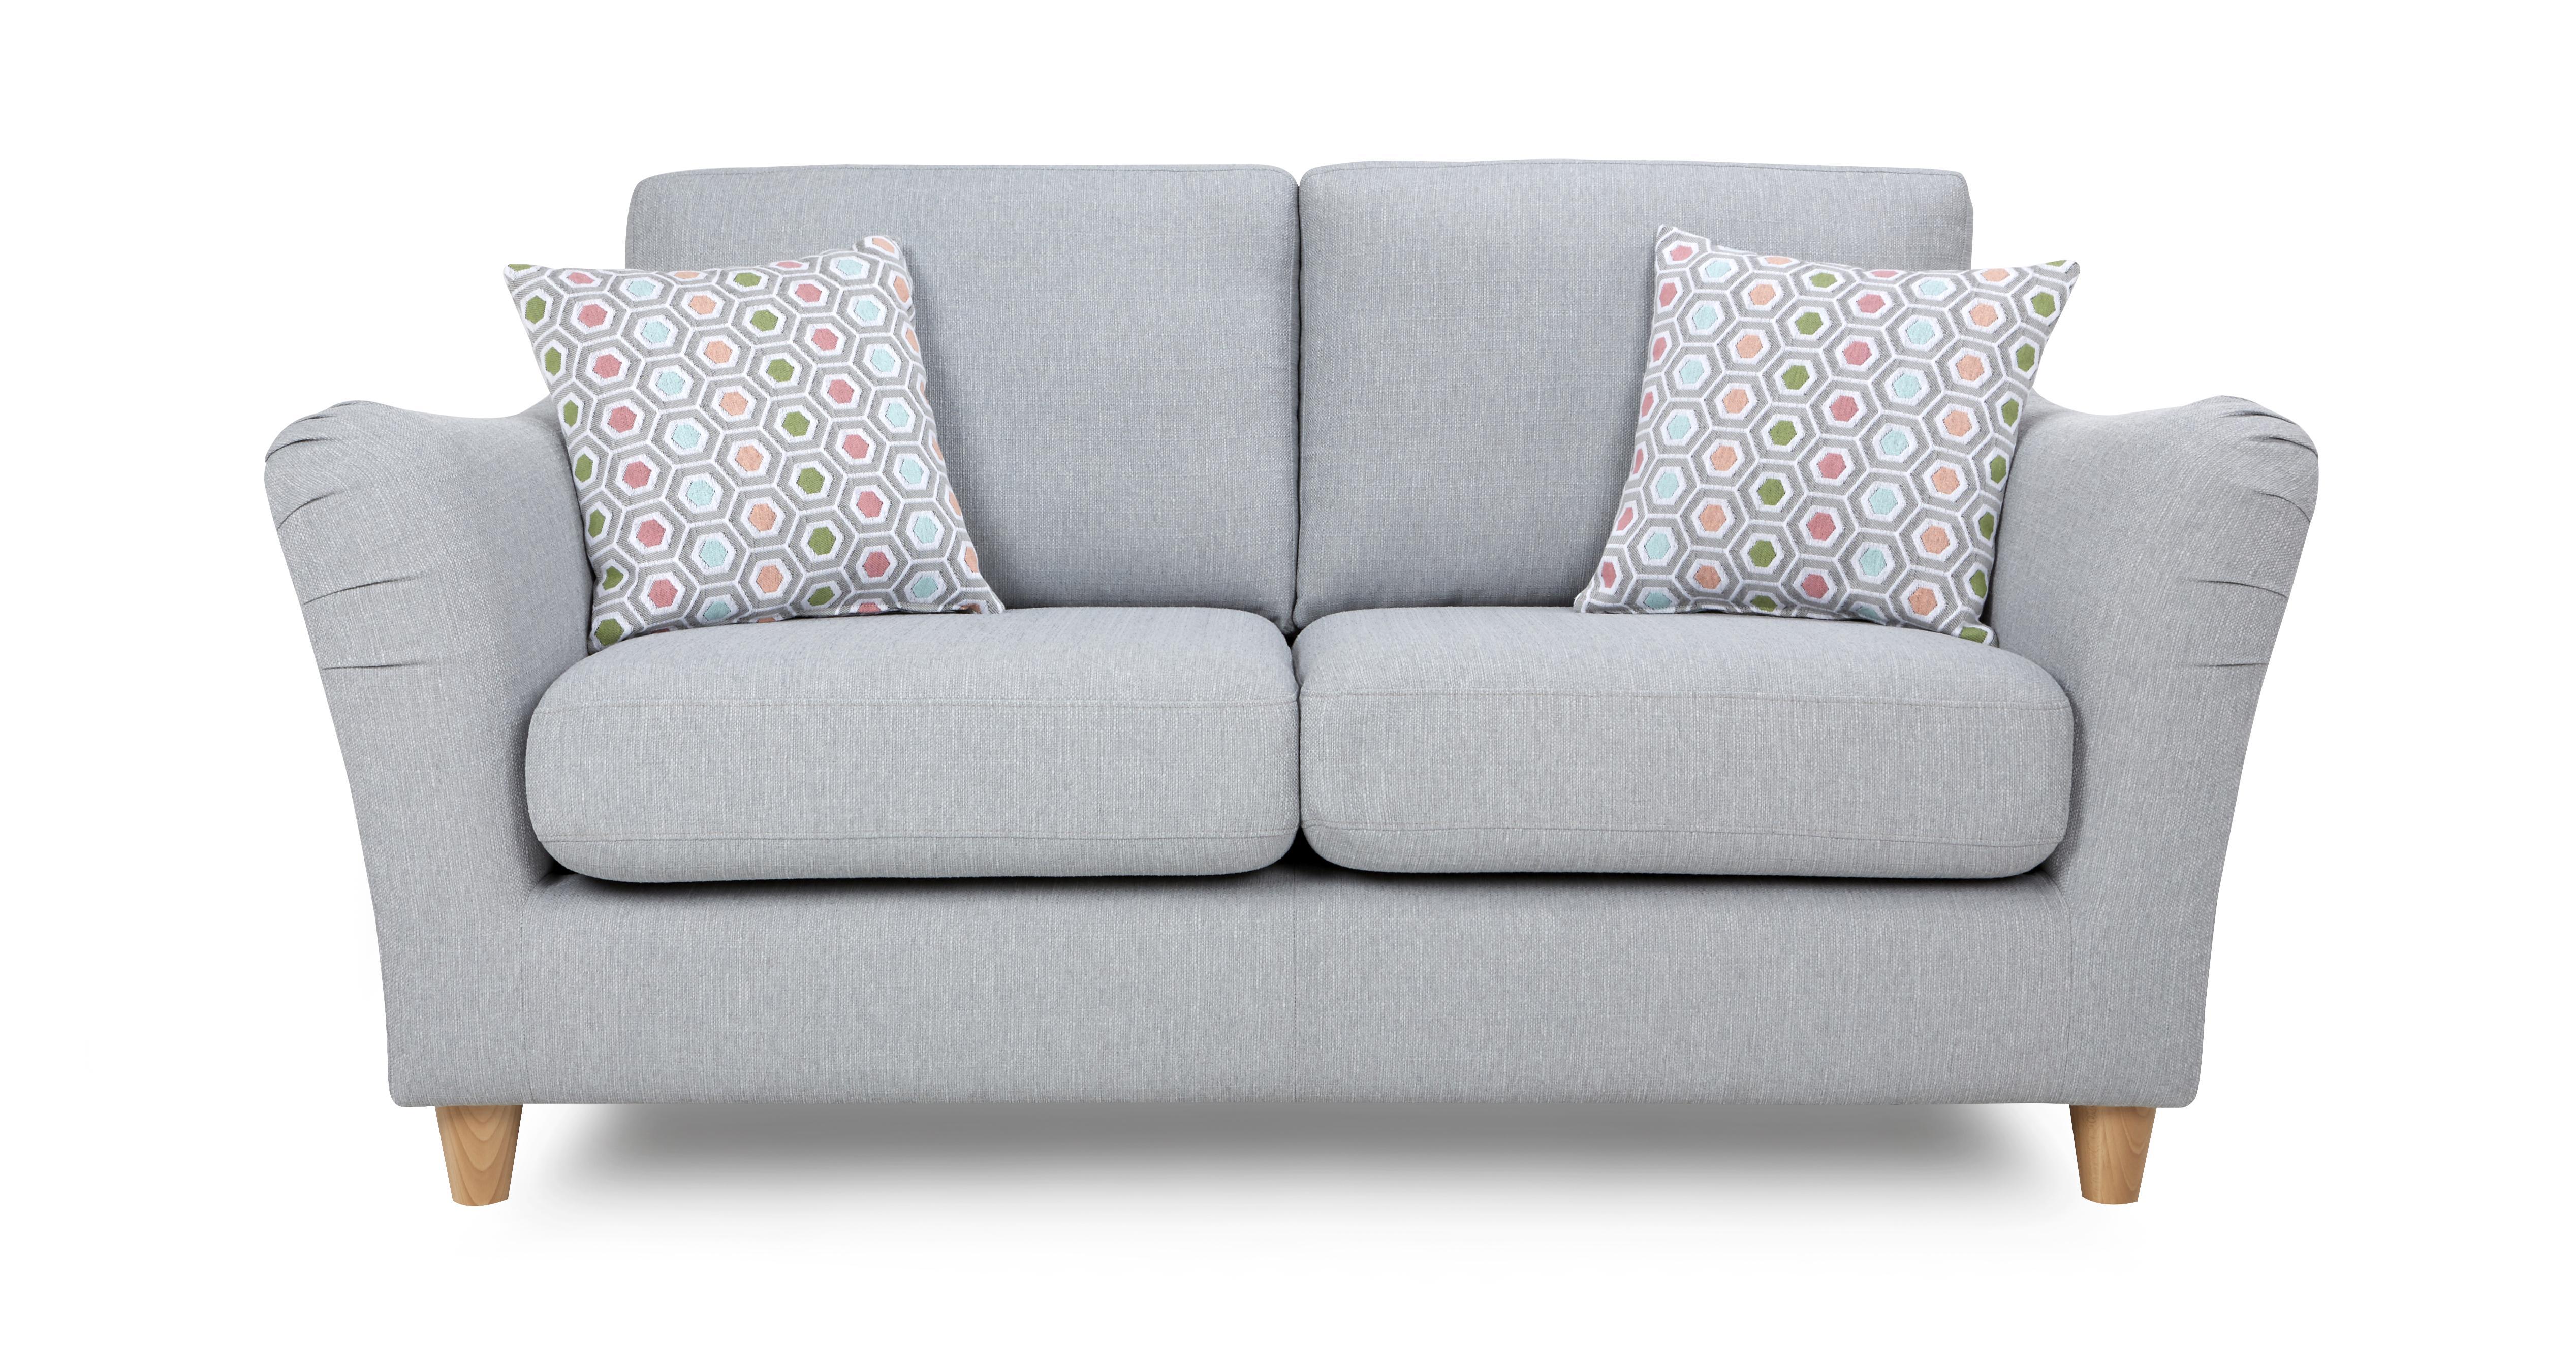 iris 2 zitsbank opera dfs banken. Black Bedroom Furniture Sets. Home Design Ideas